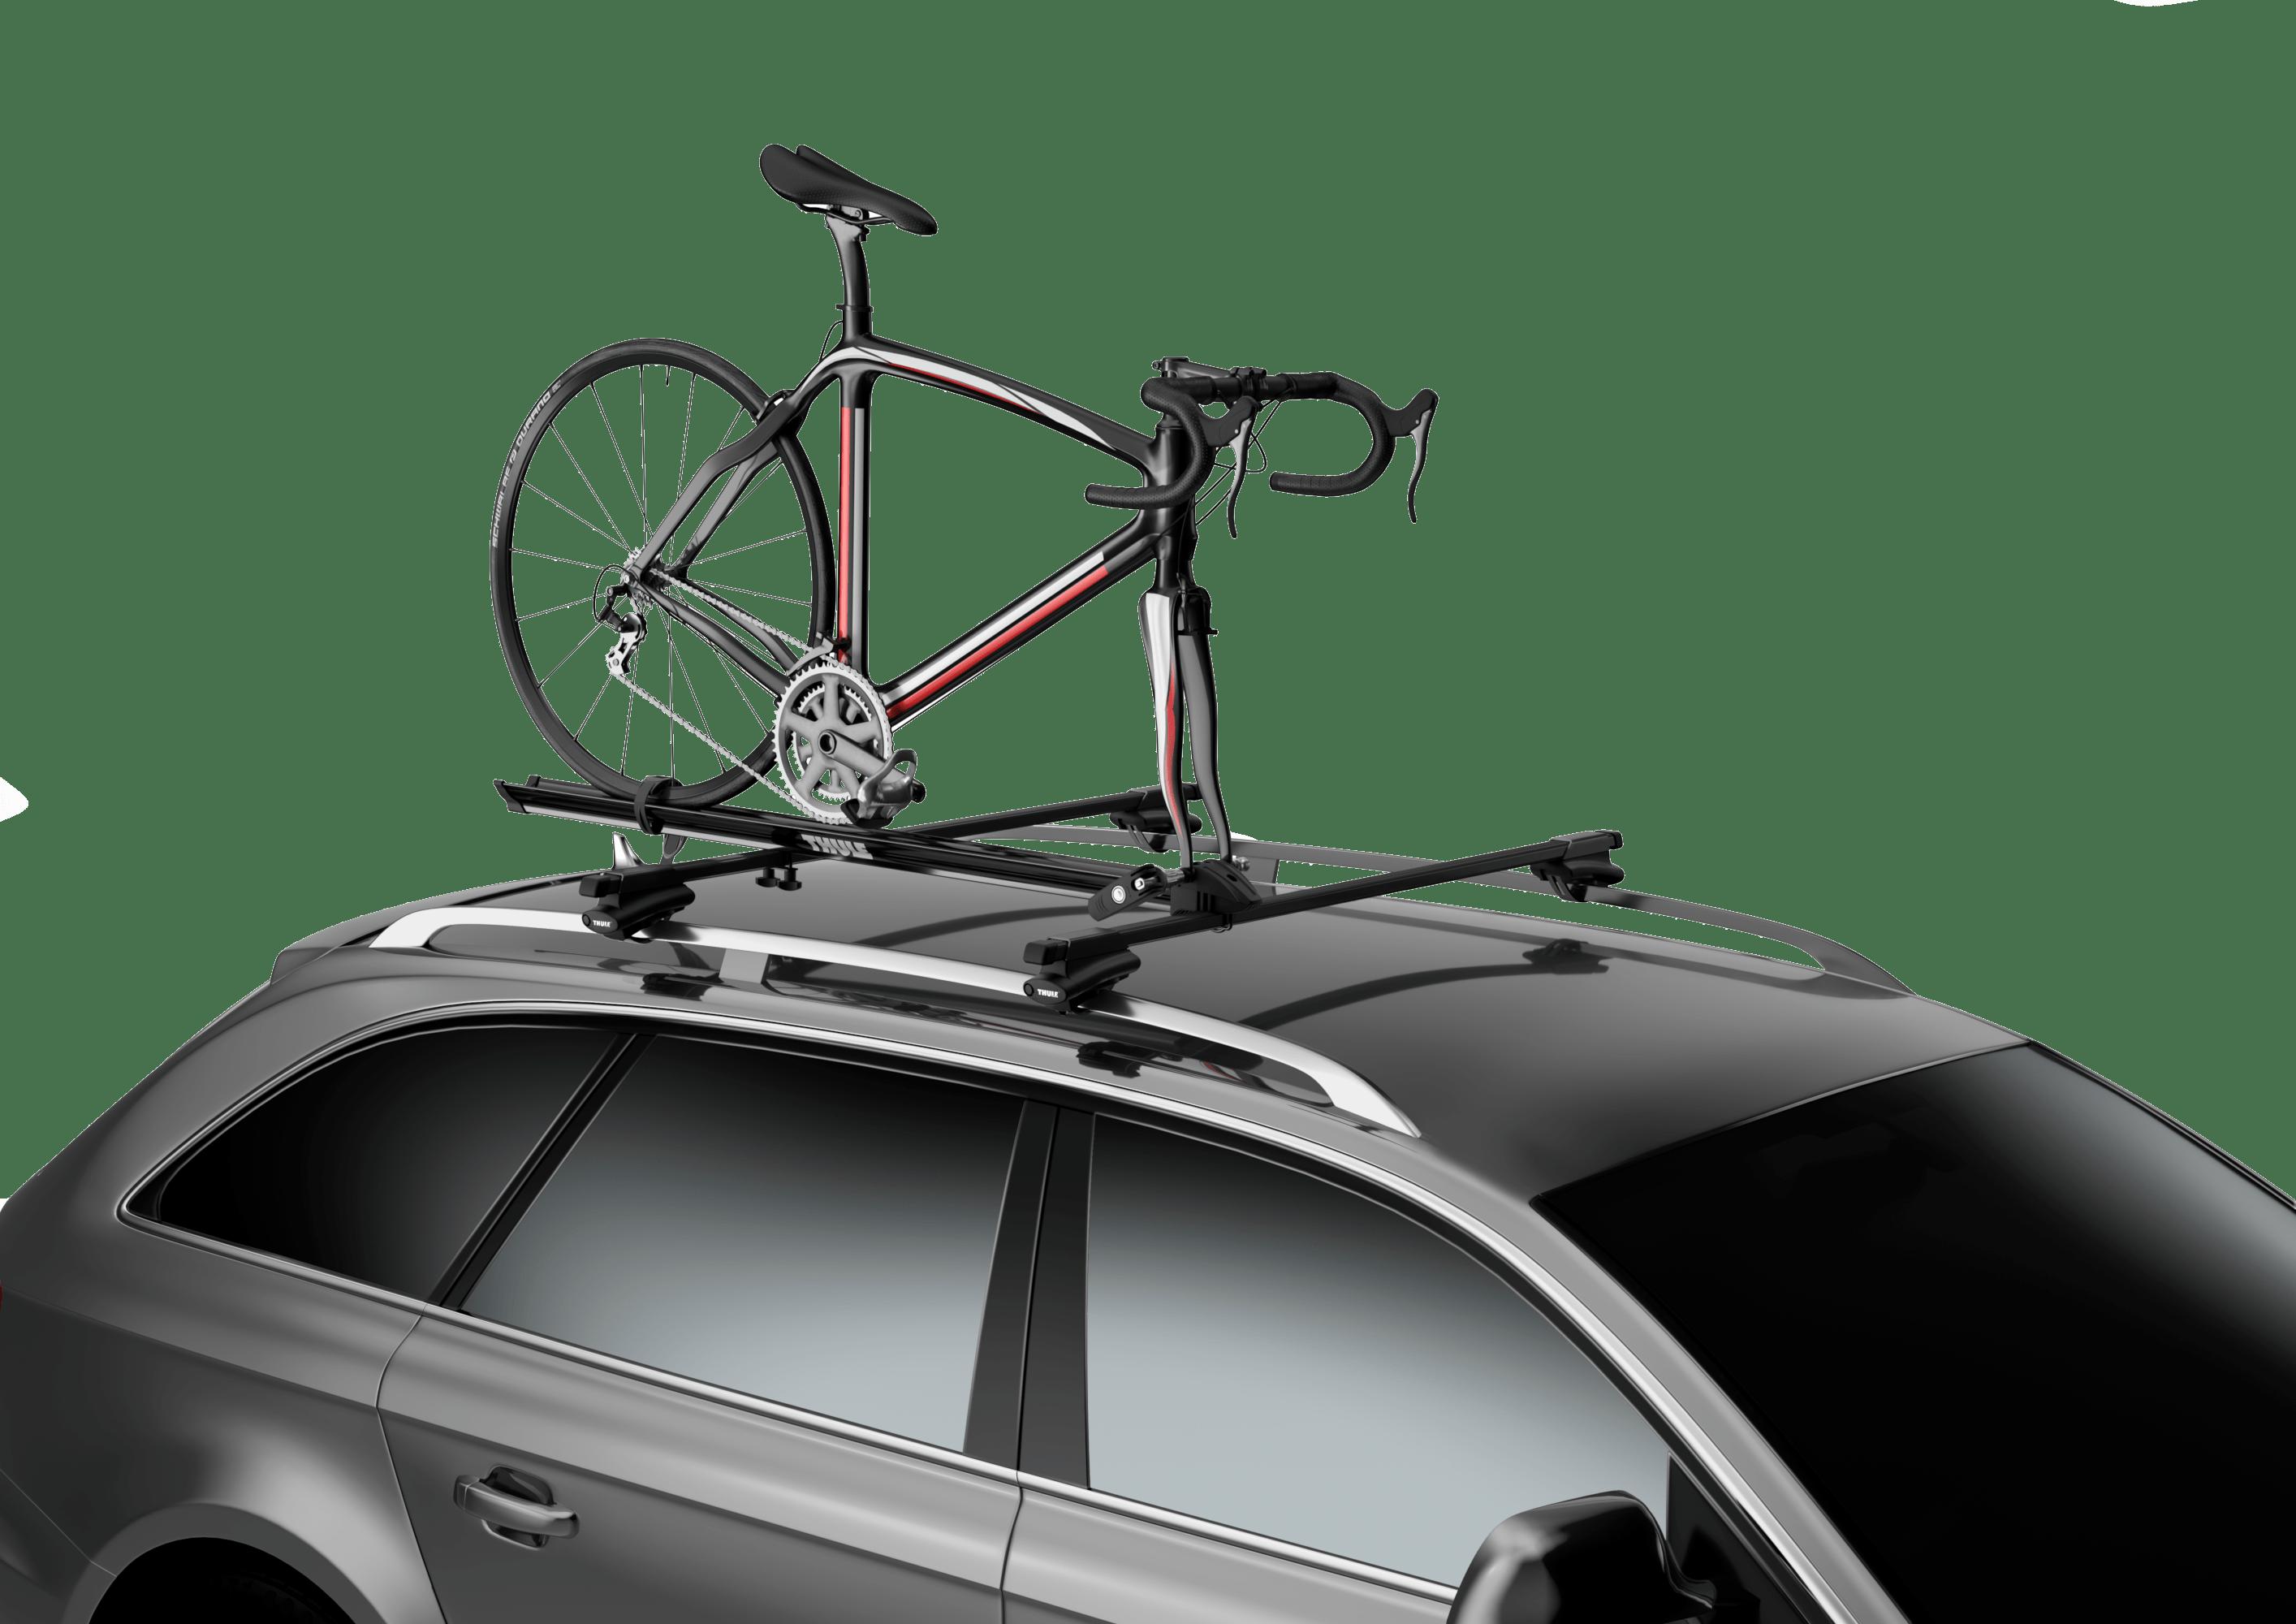 thule roof bike rack, thule roof bike racks, thule prologue bike rack